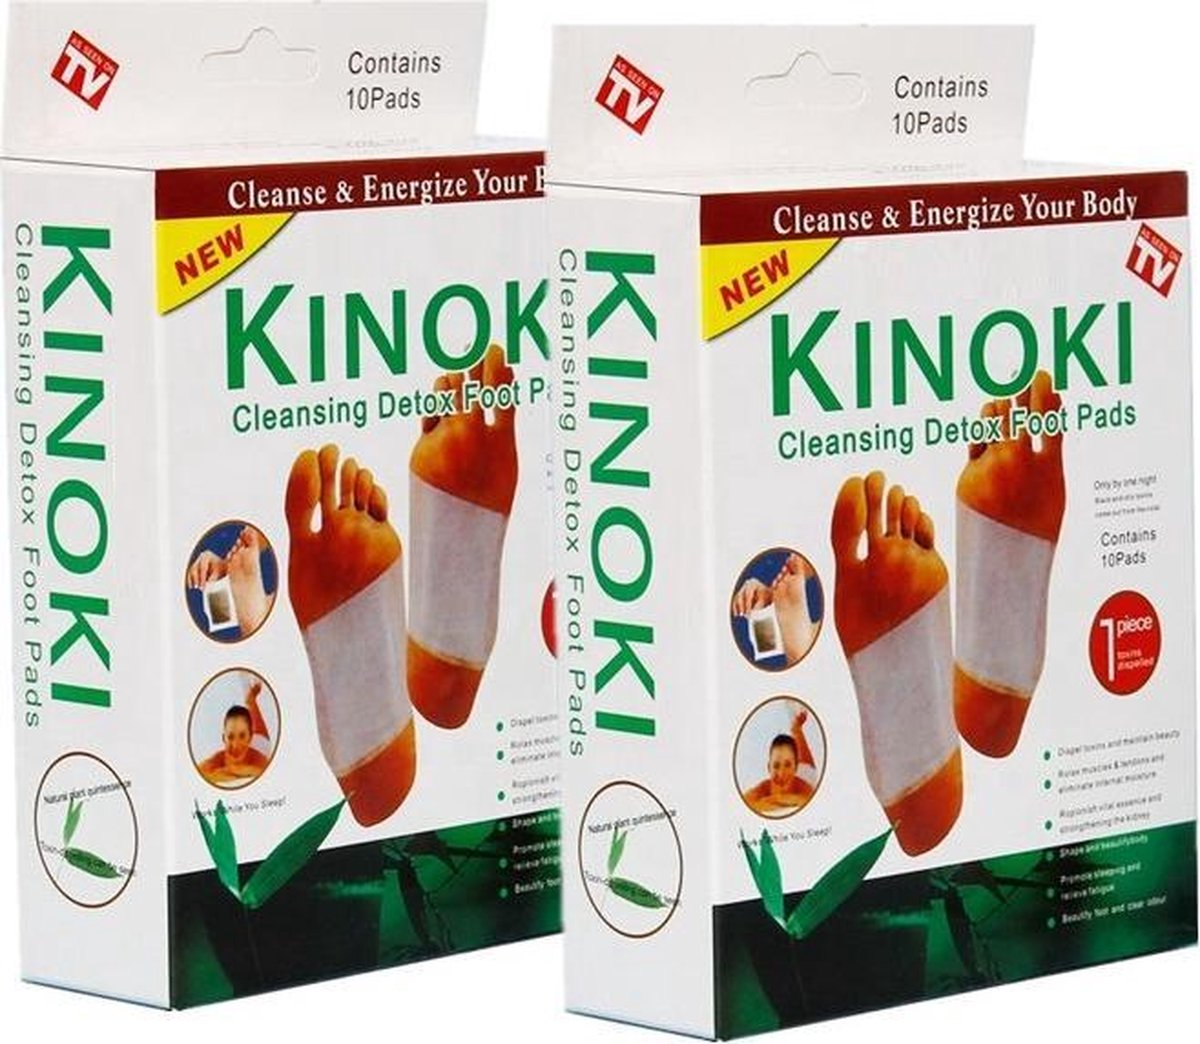 Kinoki detox voetpleisters - Detox pleisters - Ontgift het lichaam - 2x 10 stuks